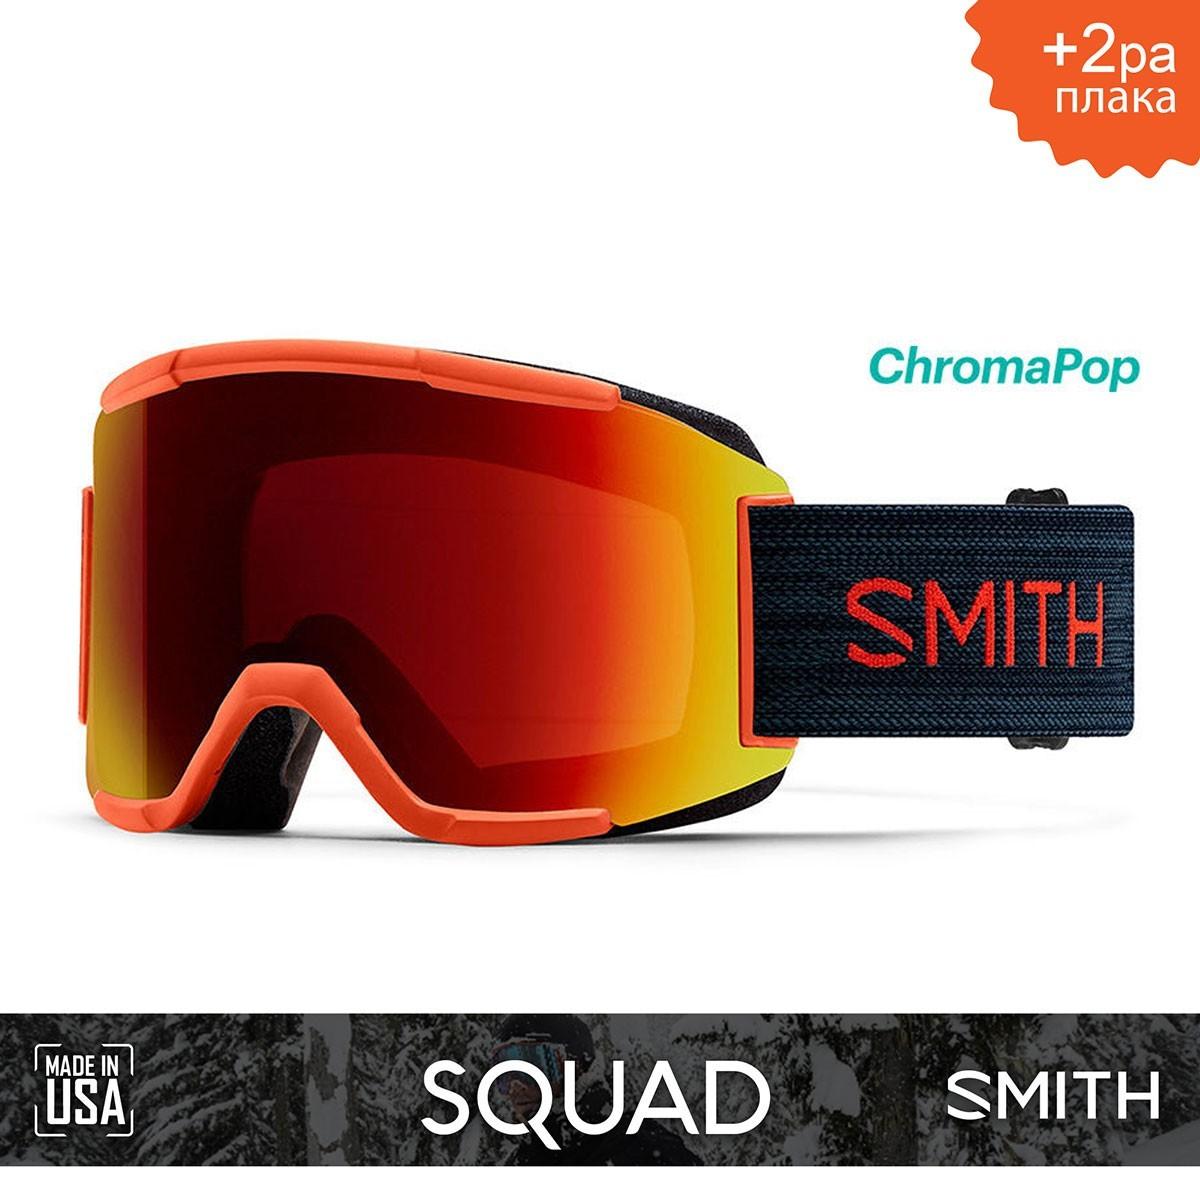 SMITH SQUAD Red Rock | S3 CHROMAPOP Sun Red Mirror - Изображение - AQUAMATRIX